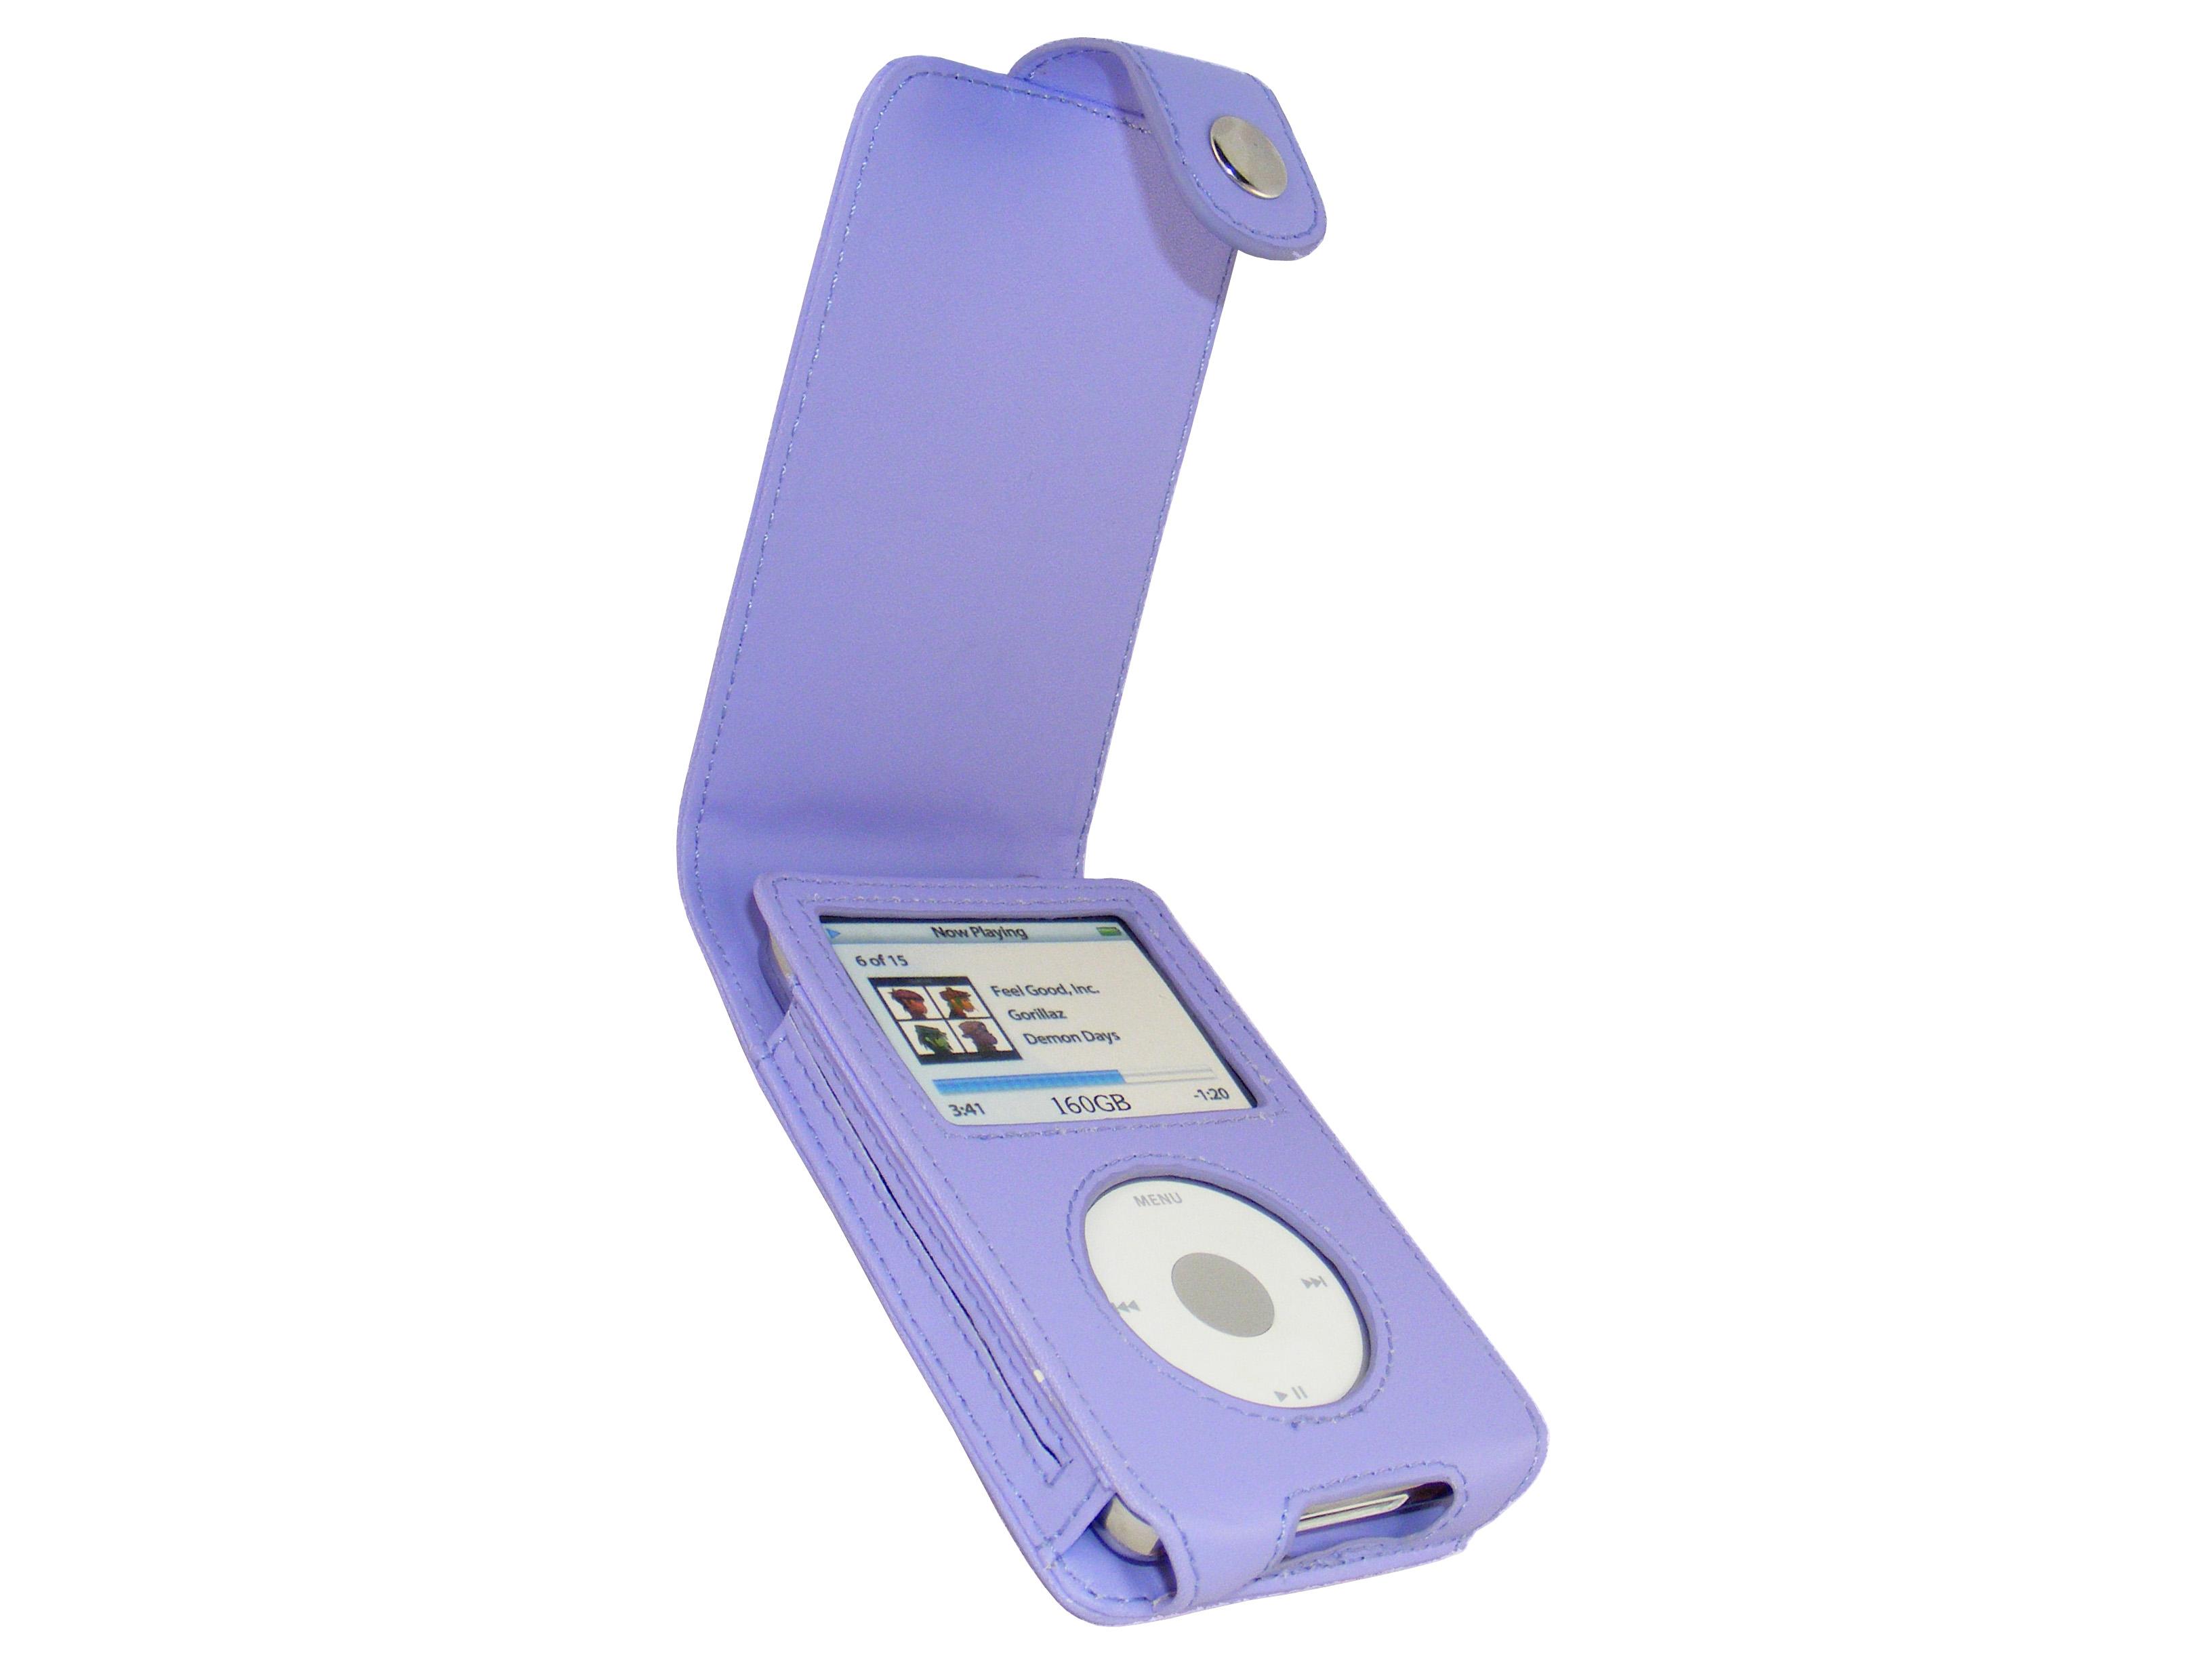 iGadgitz Purple PU Leather Case for Apple iPod Classic 80gb, 120gb & latest 160gb + Belt Clip & Screen Protector